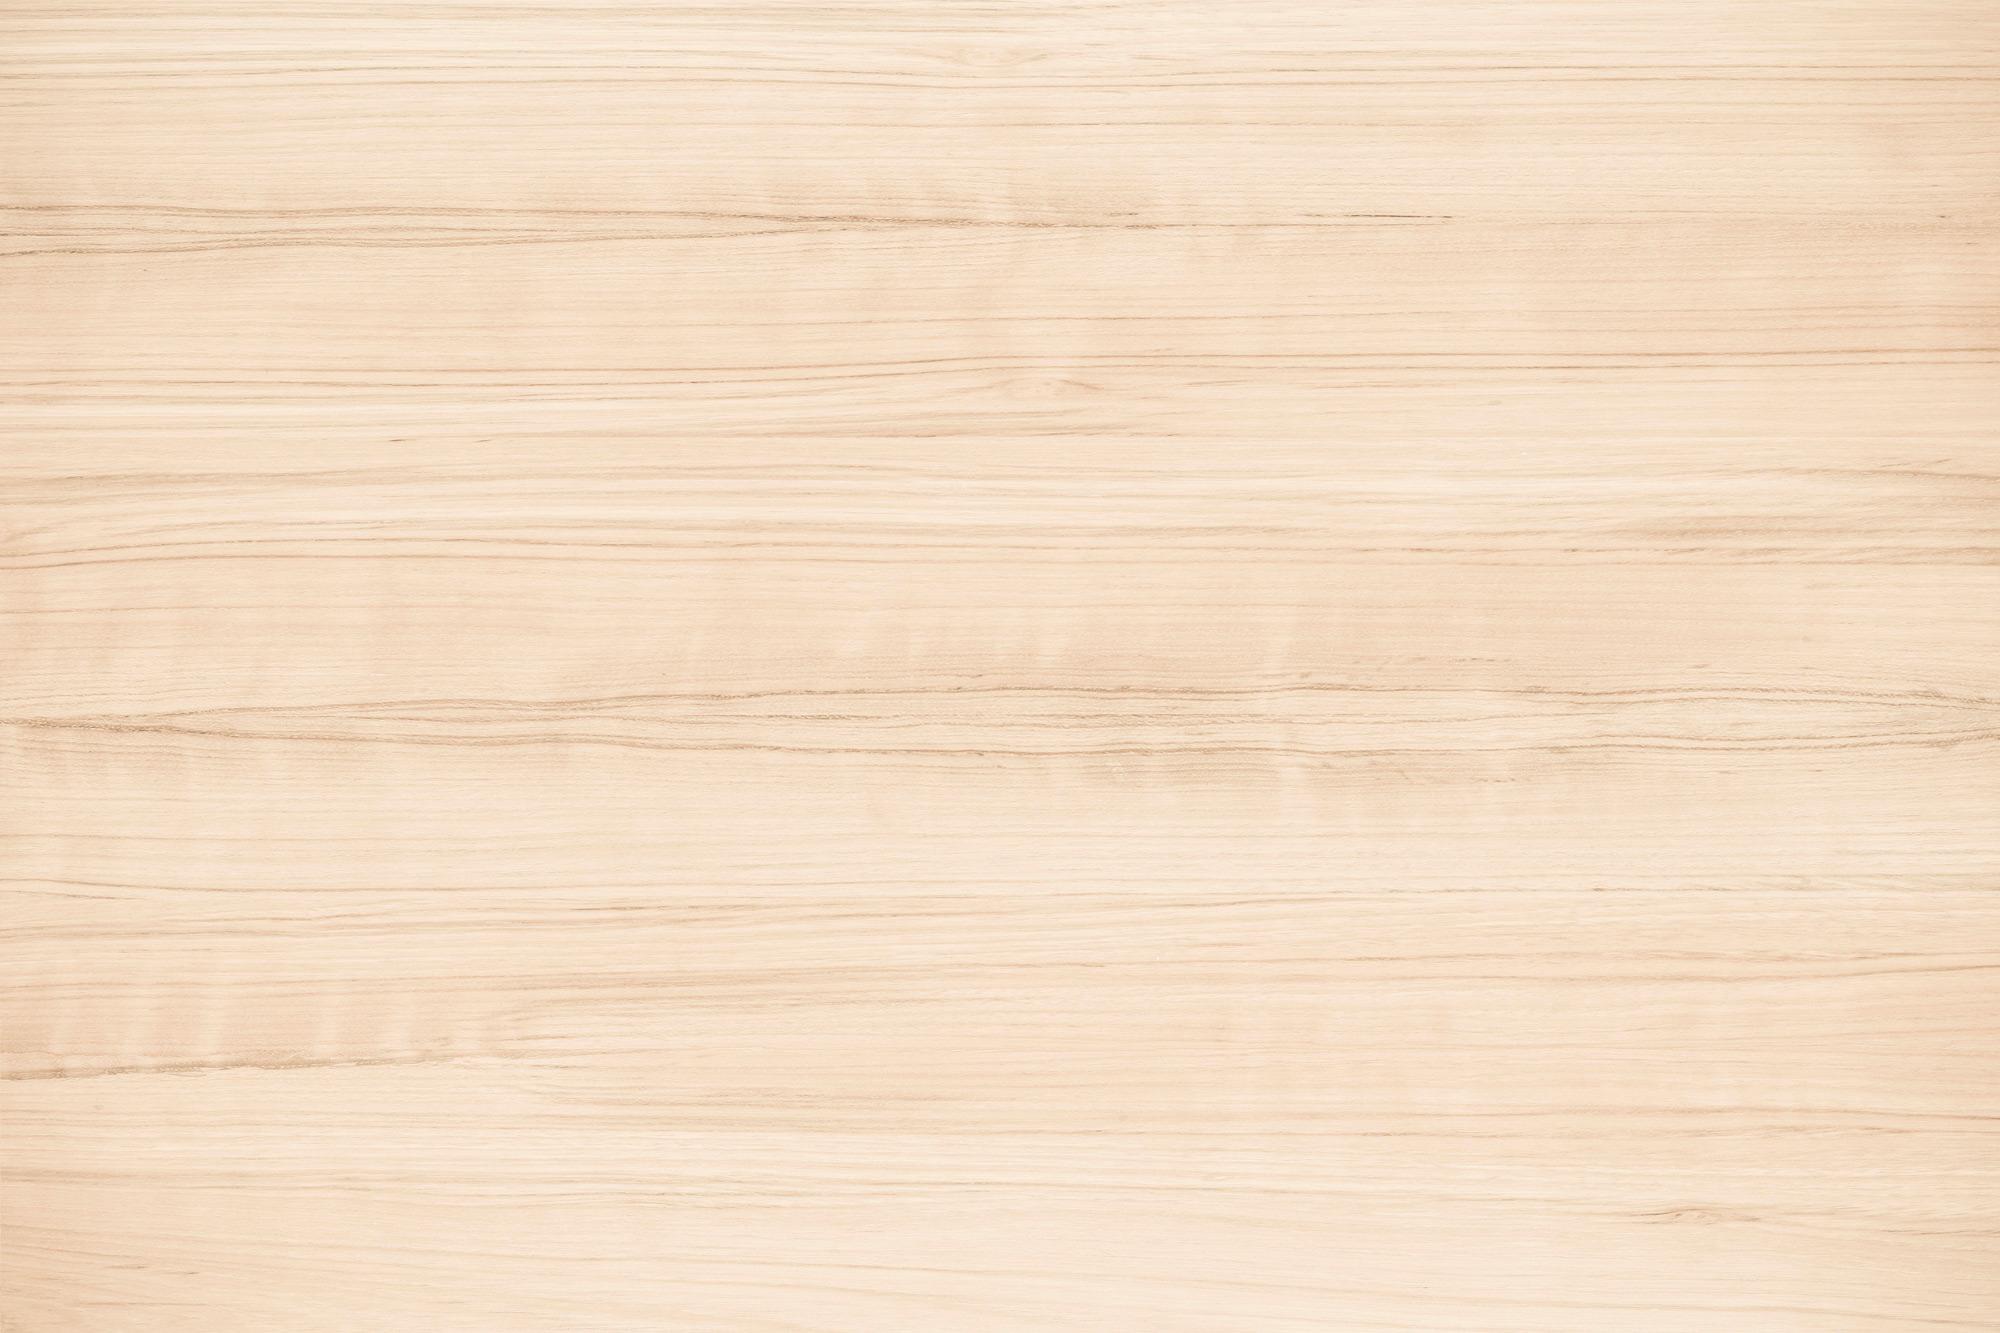 legno-di-teak-caratteristiche-manutenzione-ideagroup